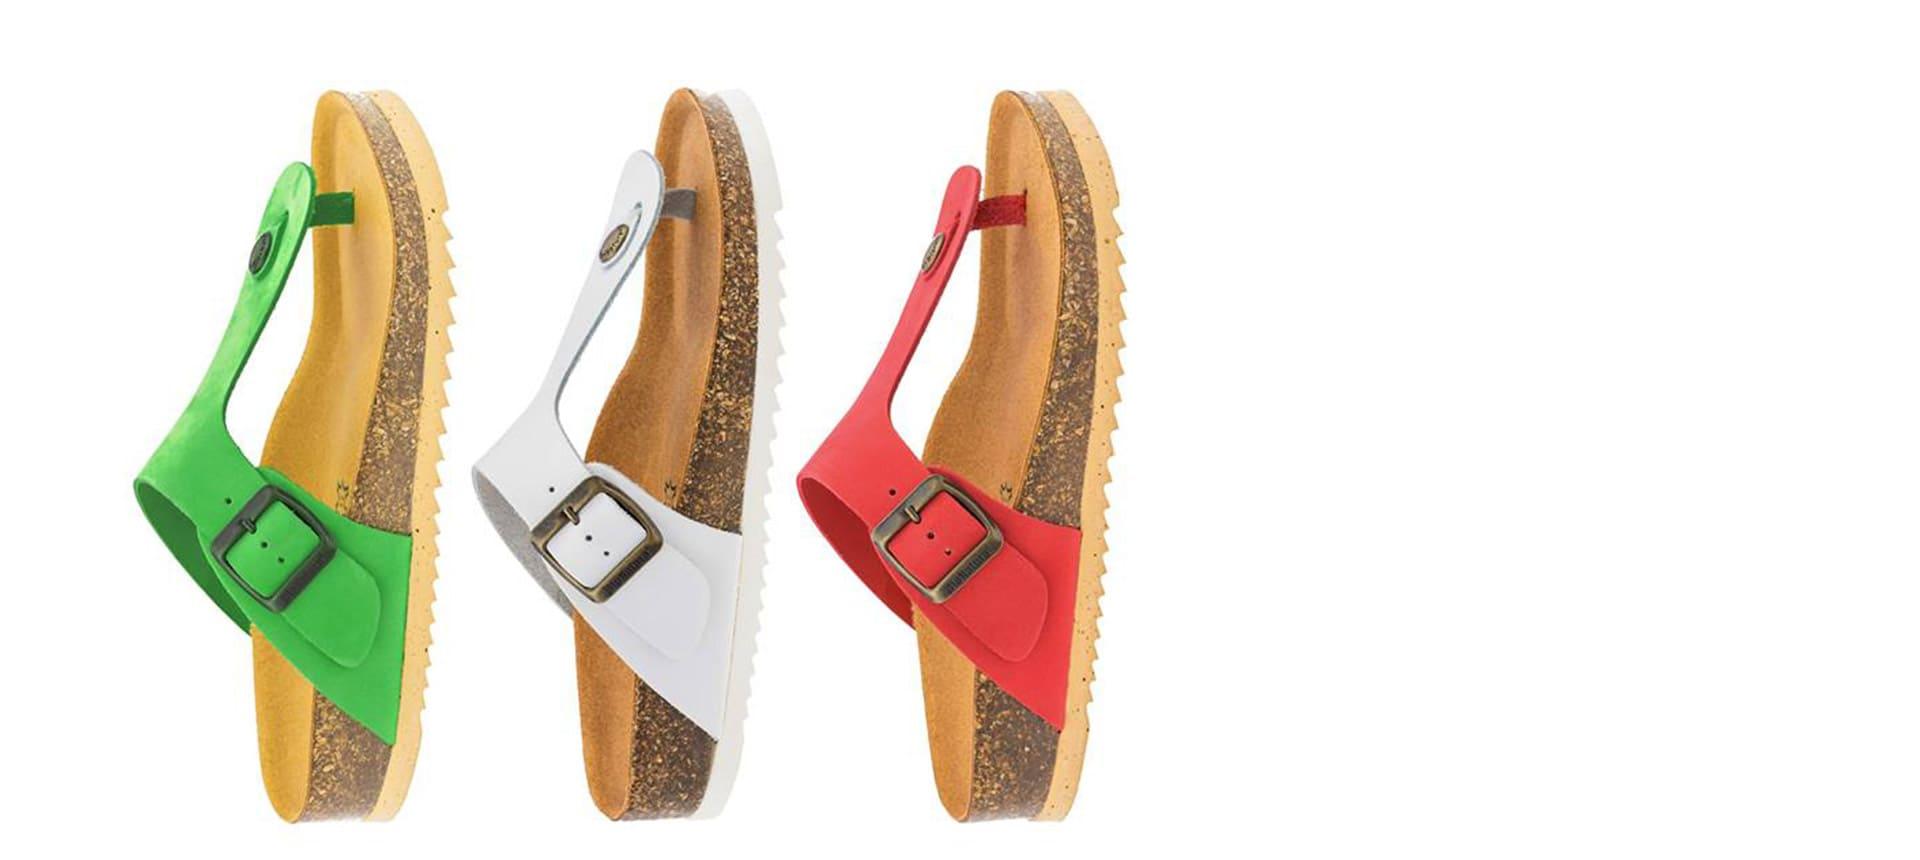 stampa-di-fondi-e-suole-per-calzature